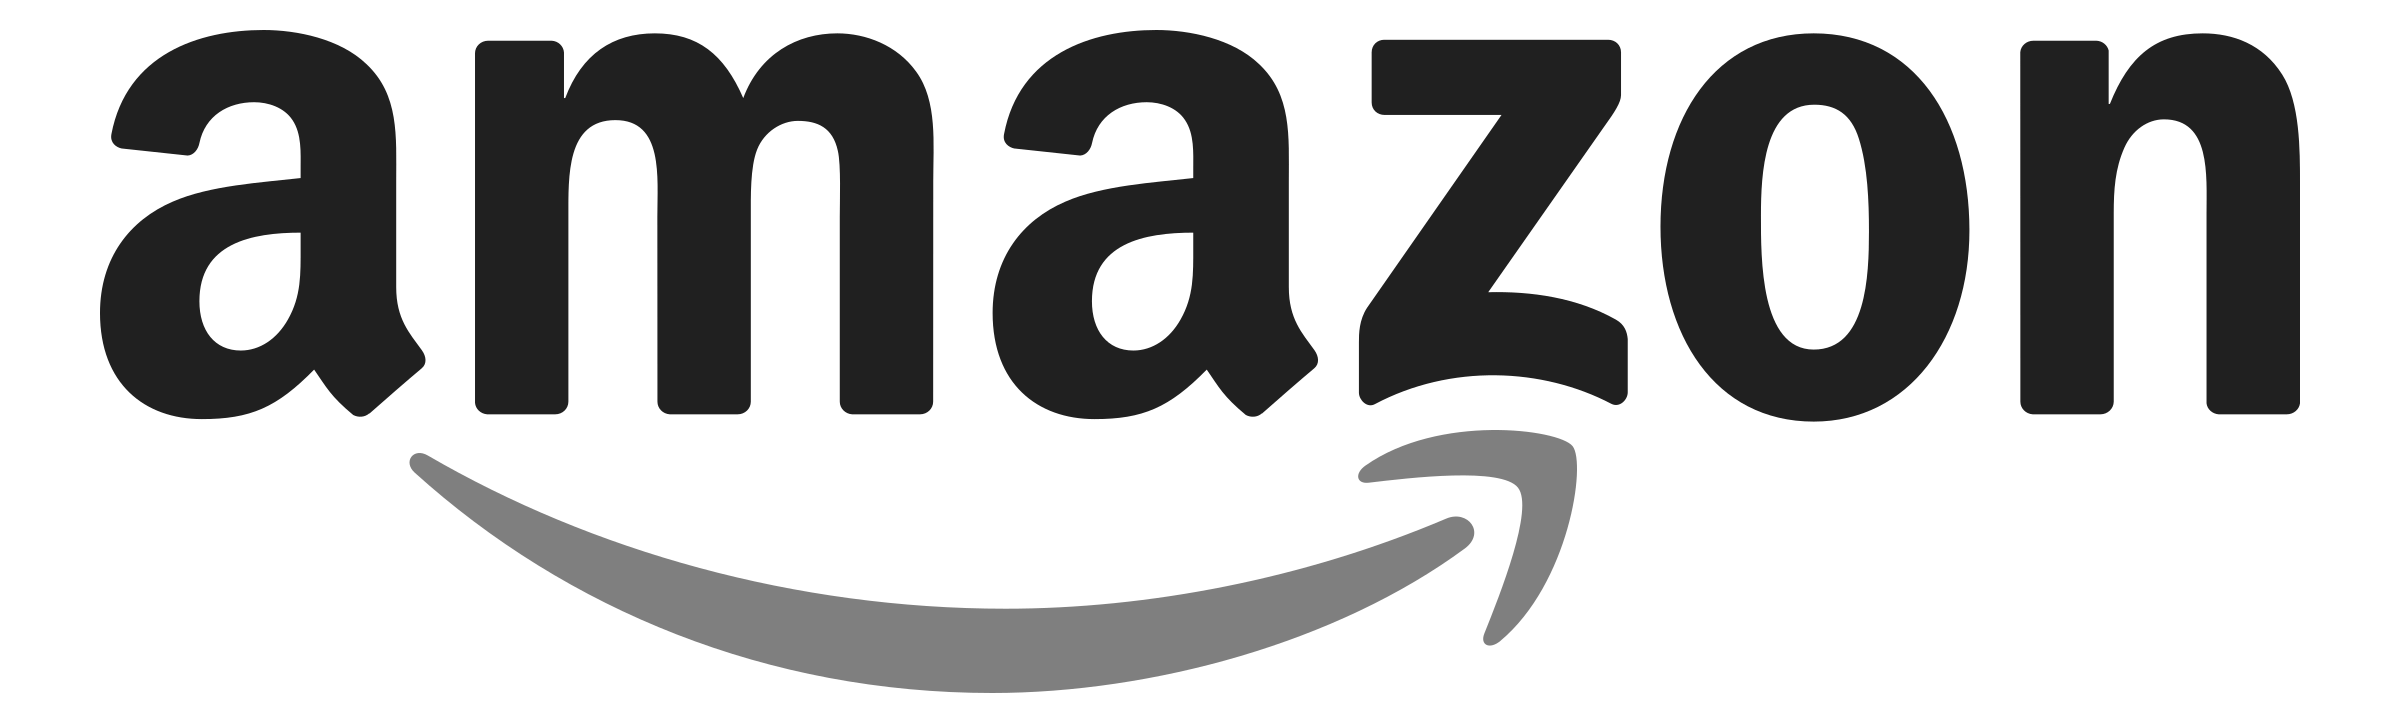 Amazon copy.png